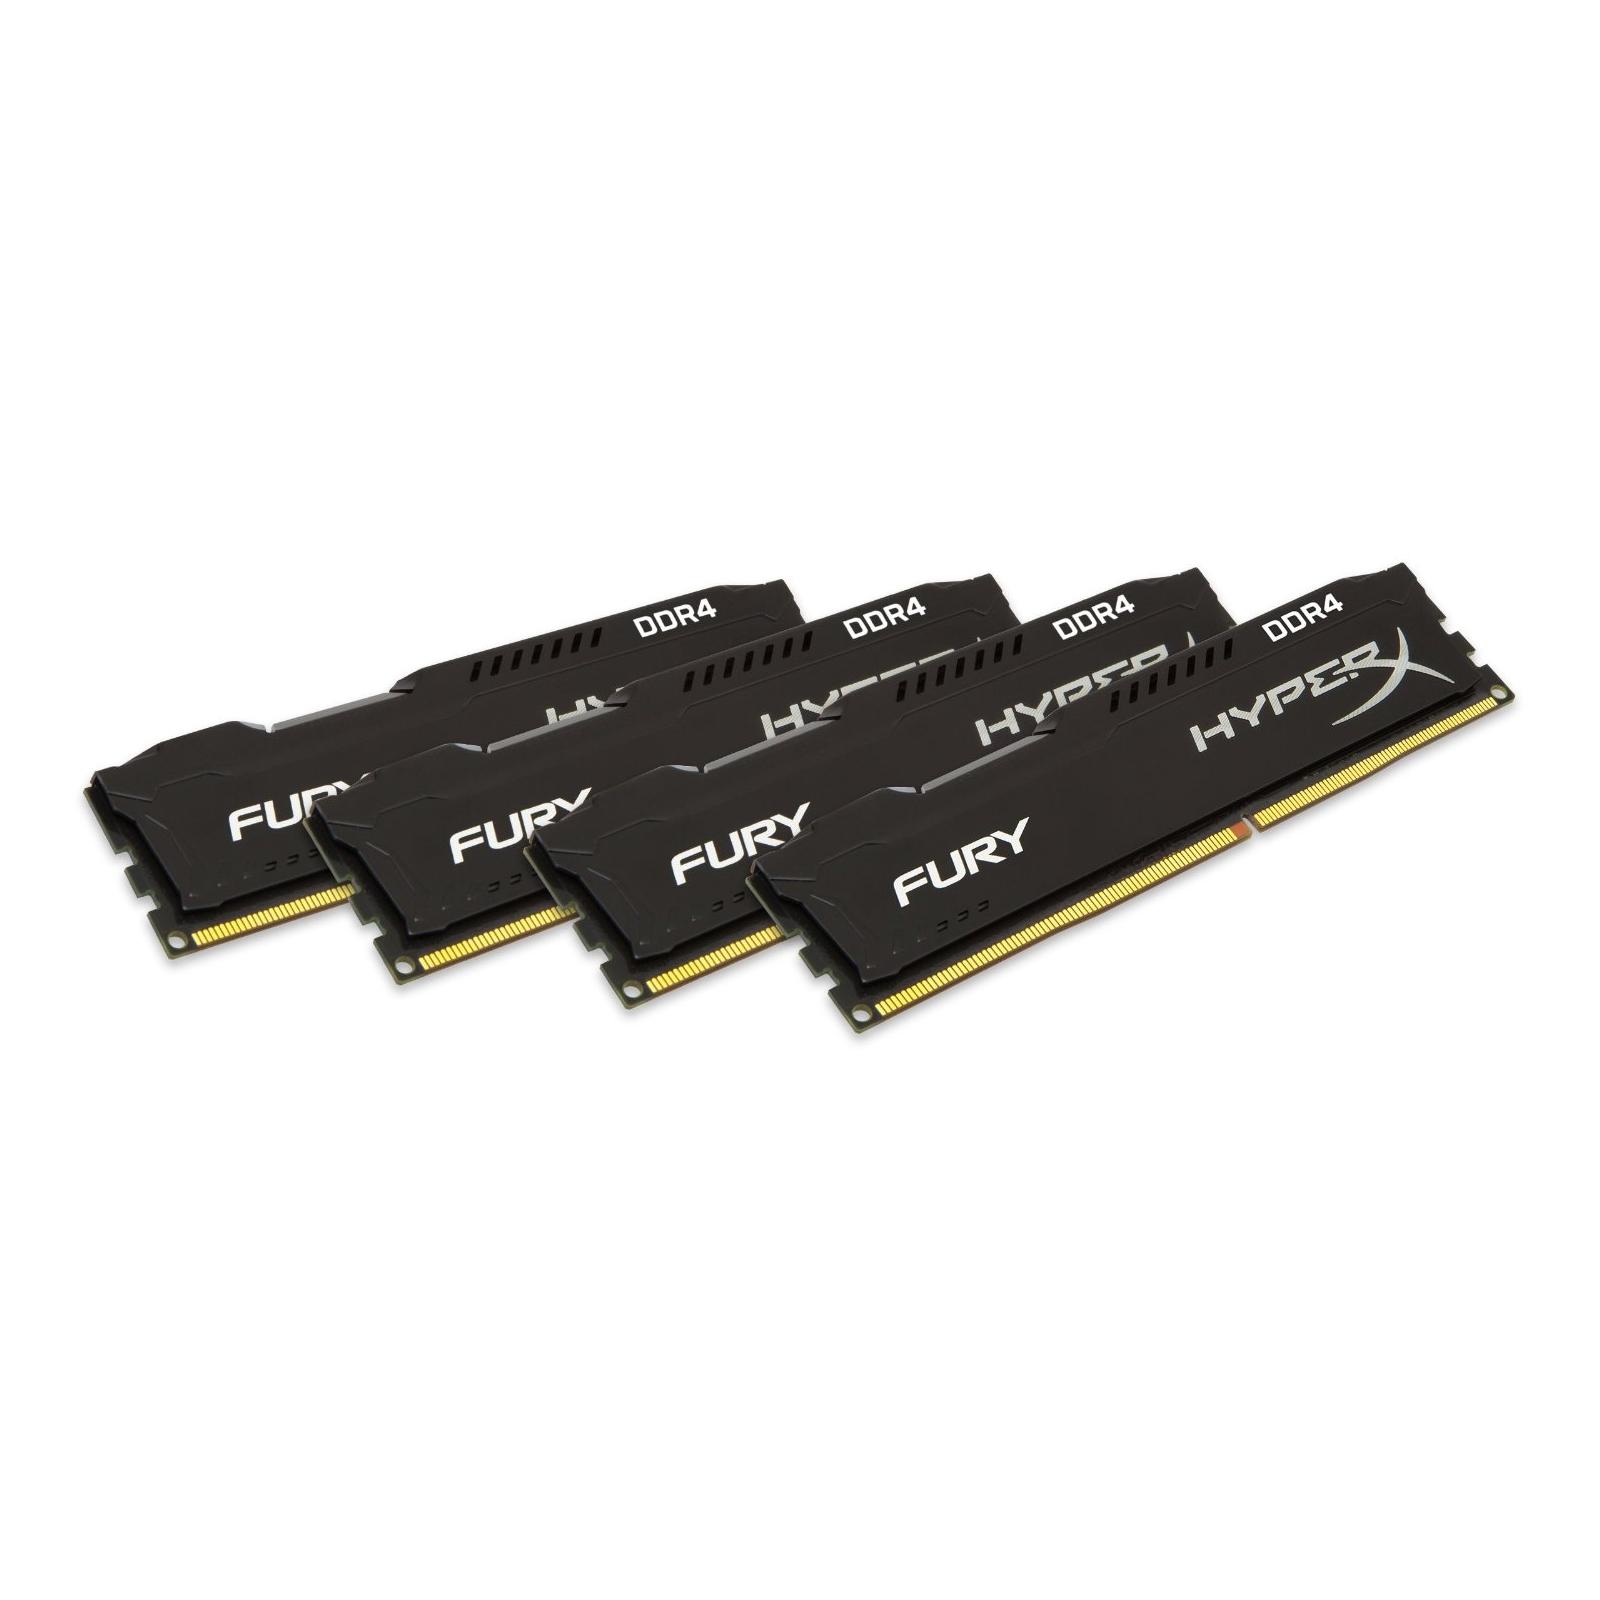 Модуль памяти для компьютера DDR4 32GB (4x8GB) 2133 MHz HyperX FURY Black Kingston (HX421C14FB2K4/32) изображение 2